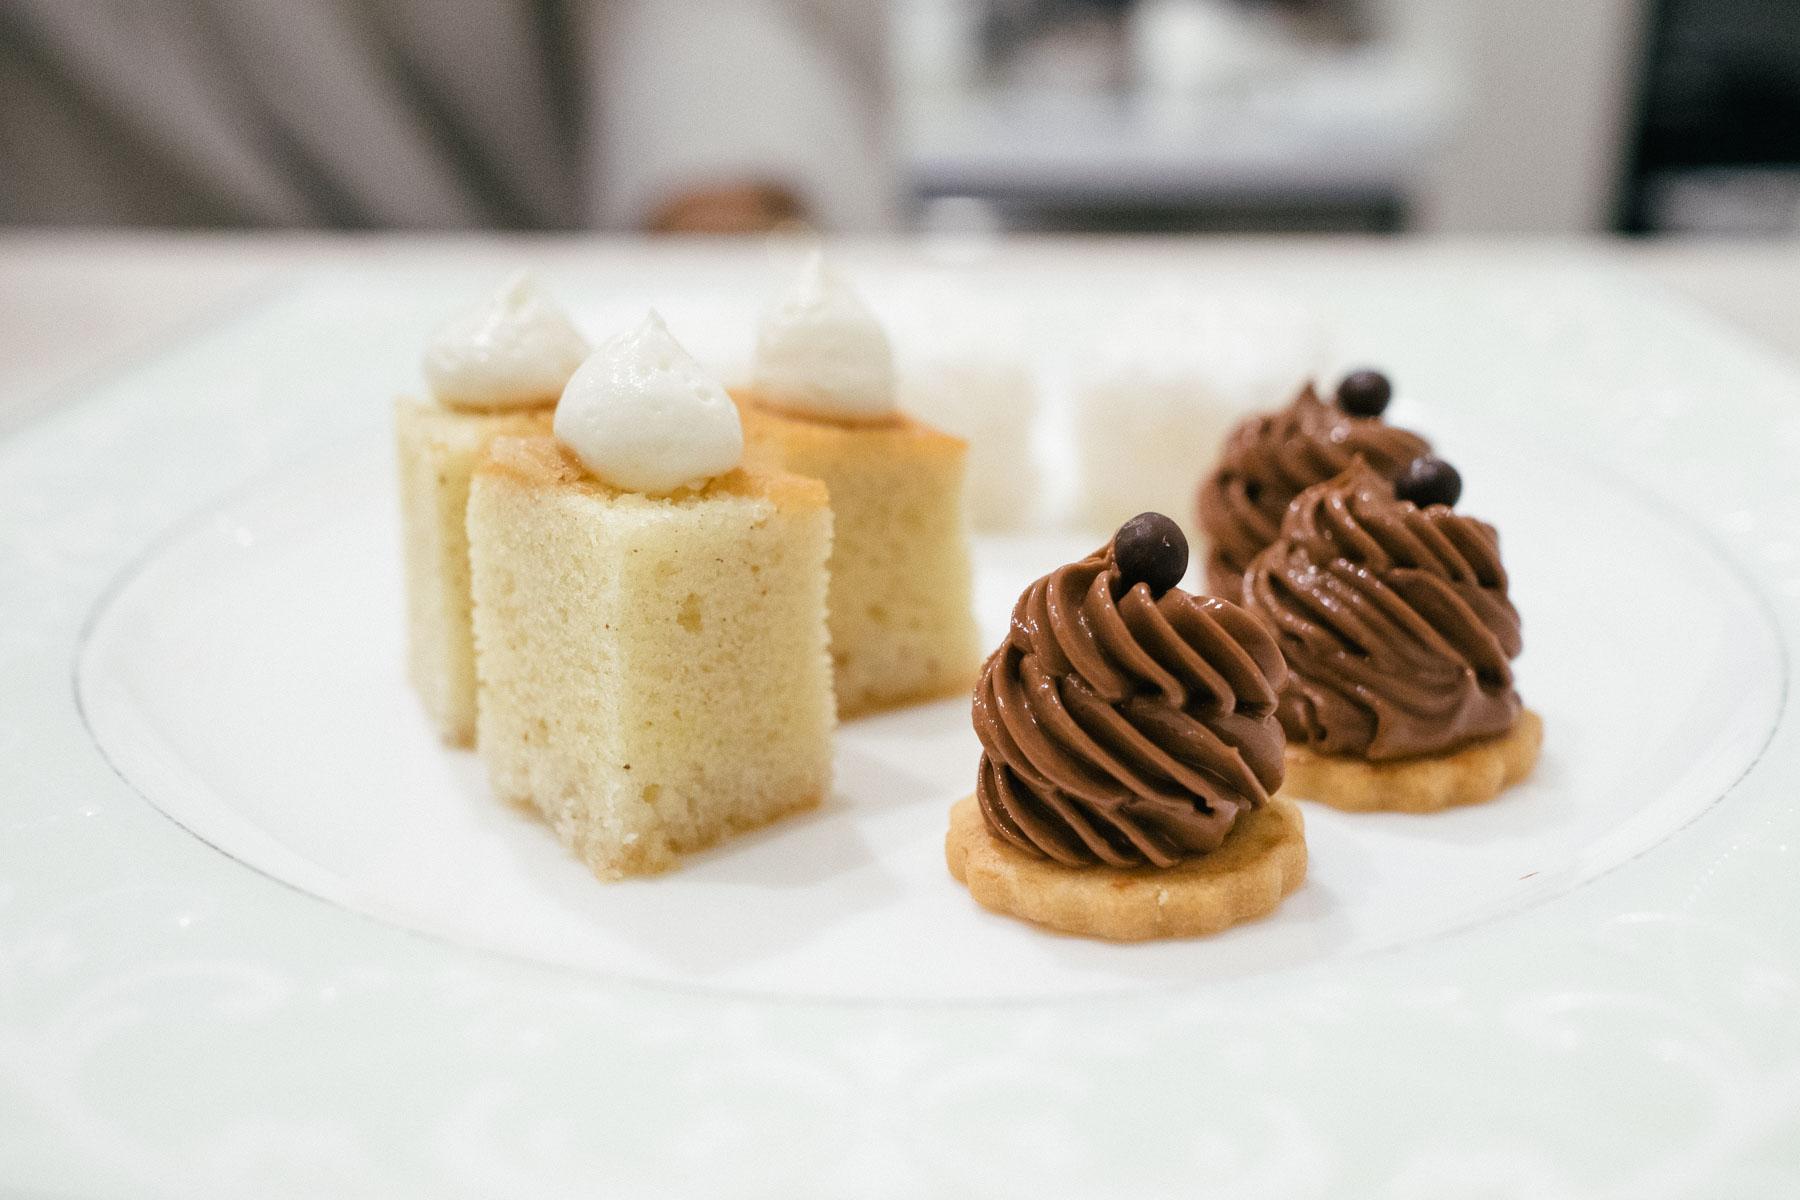 chikalicious-new-york-city-japanese-french-best-dessert-bar-nyc-les-10